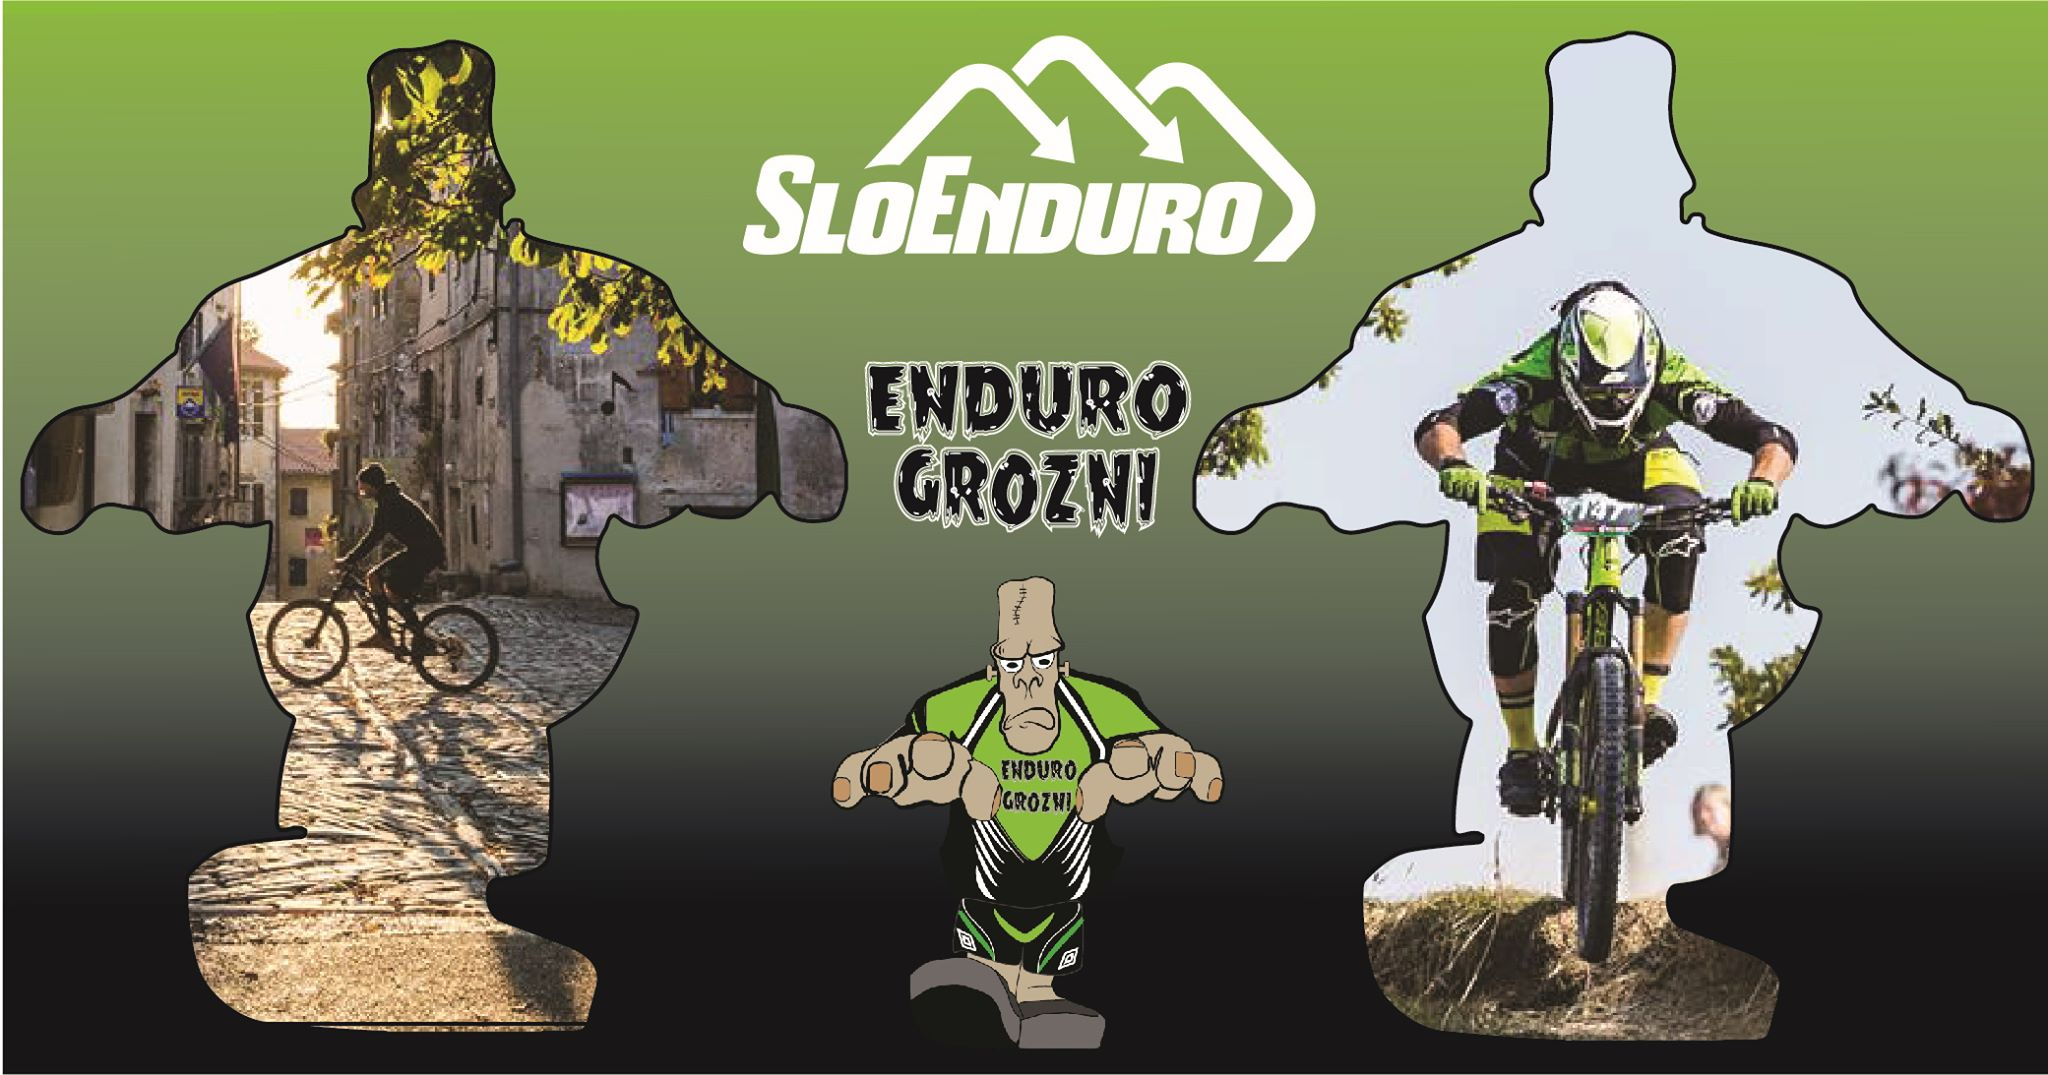 endurogrozni2019_banner